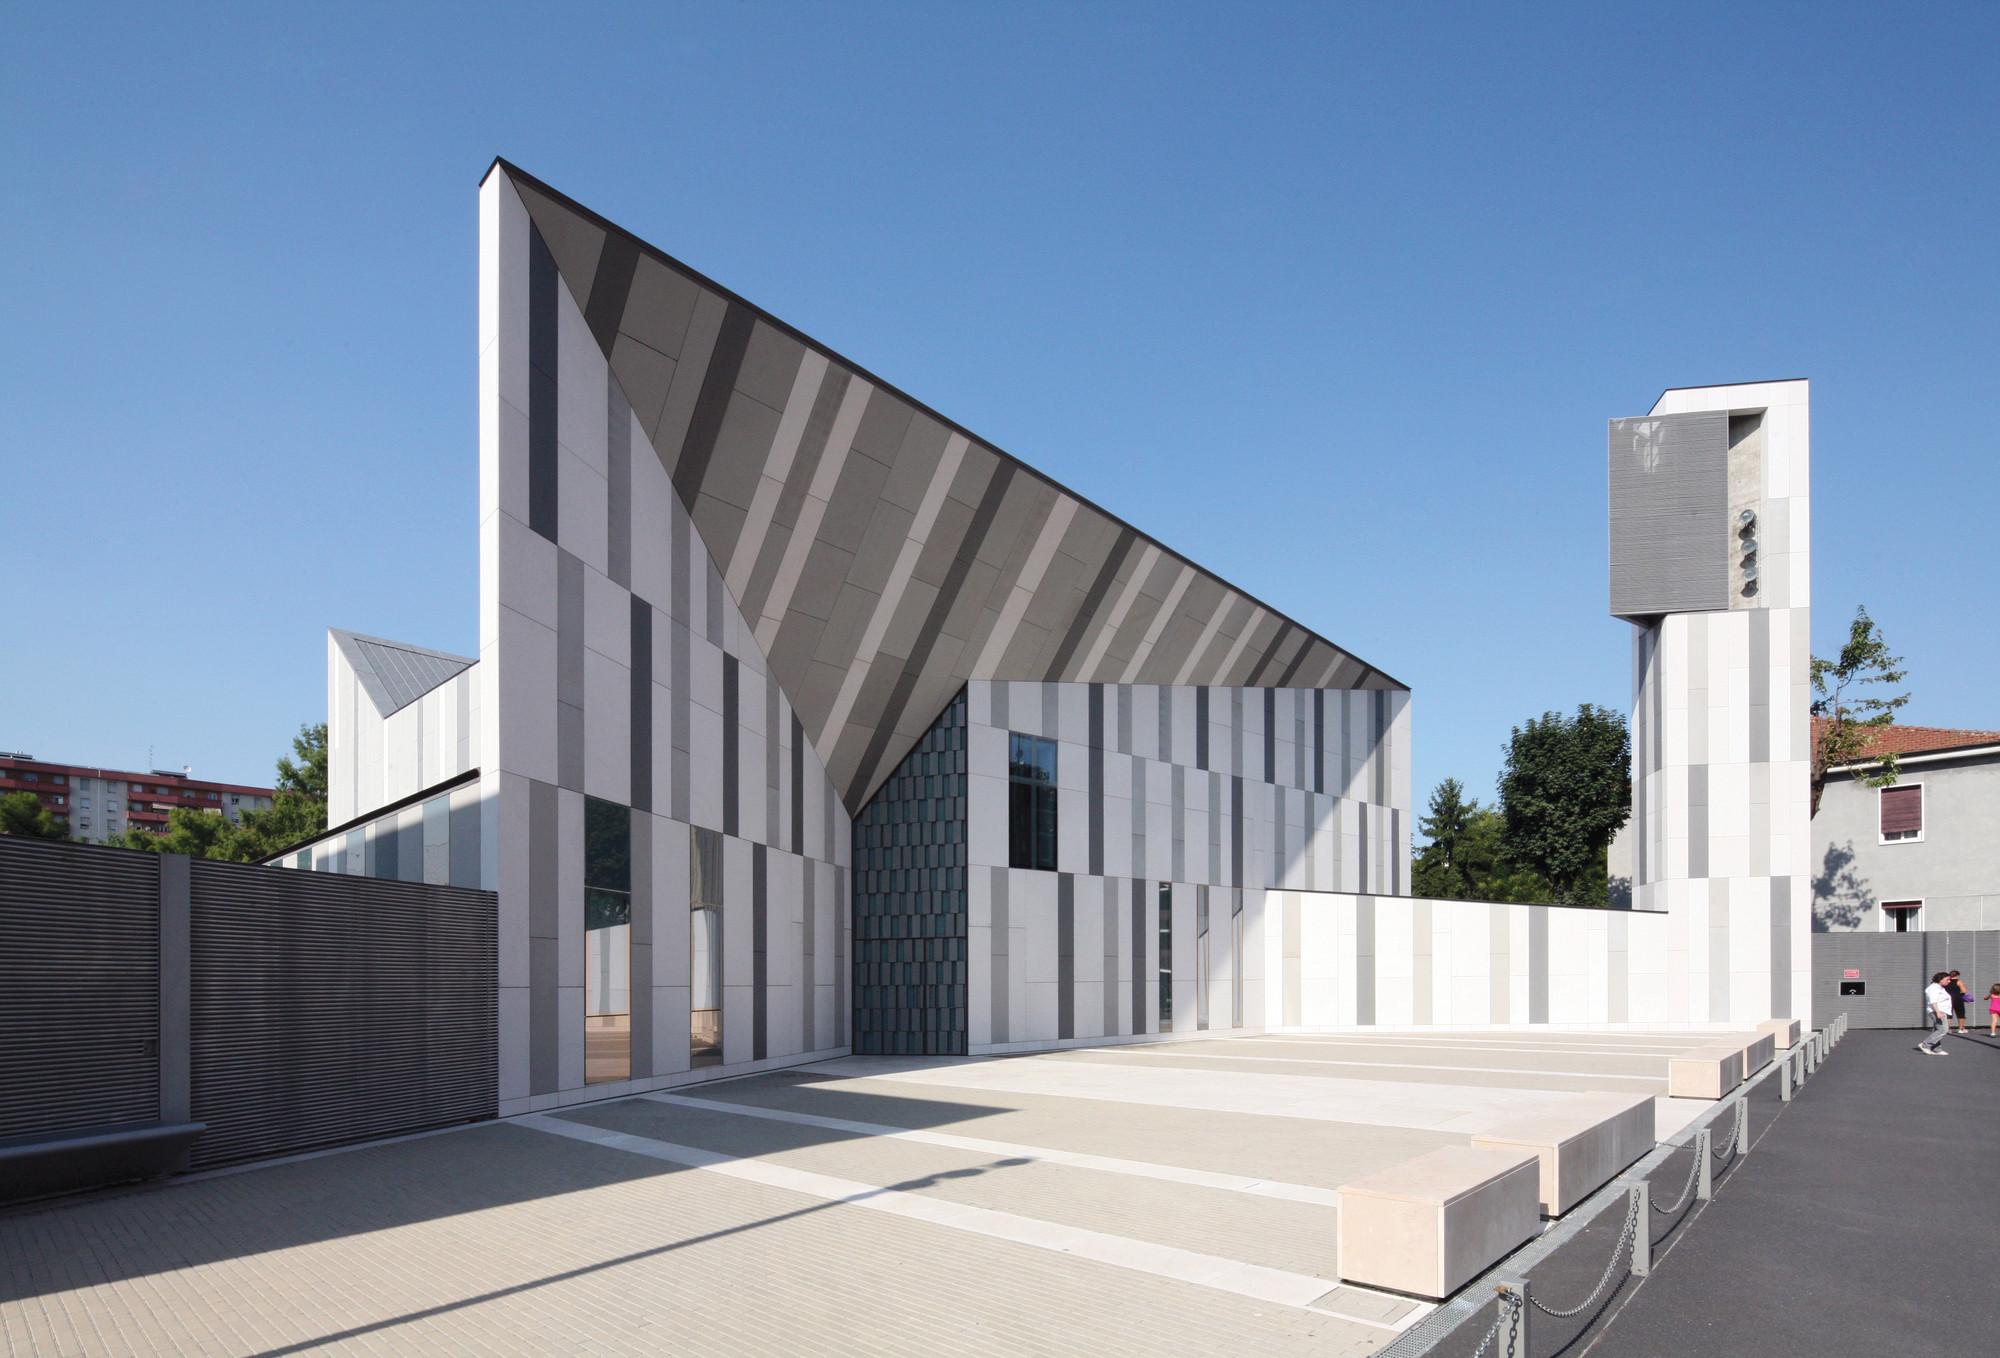 Christ resurrection church cino zucchi architetti for Church exterior design ideas